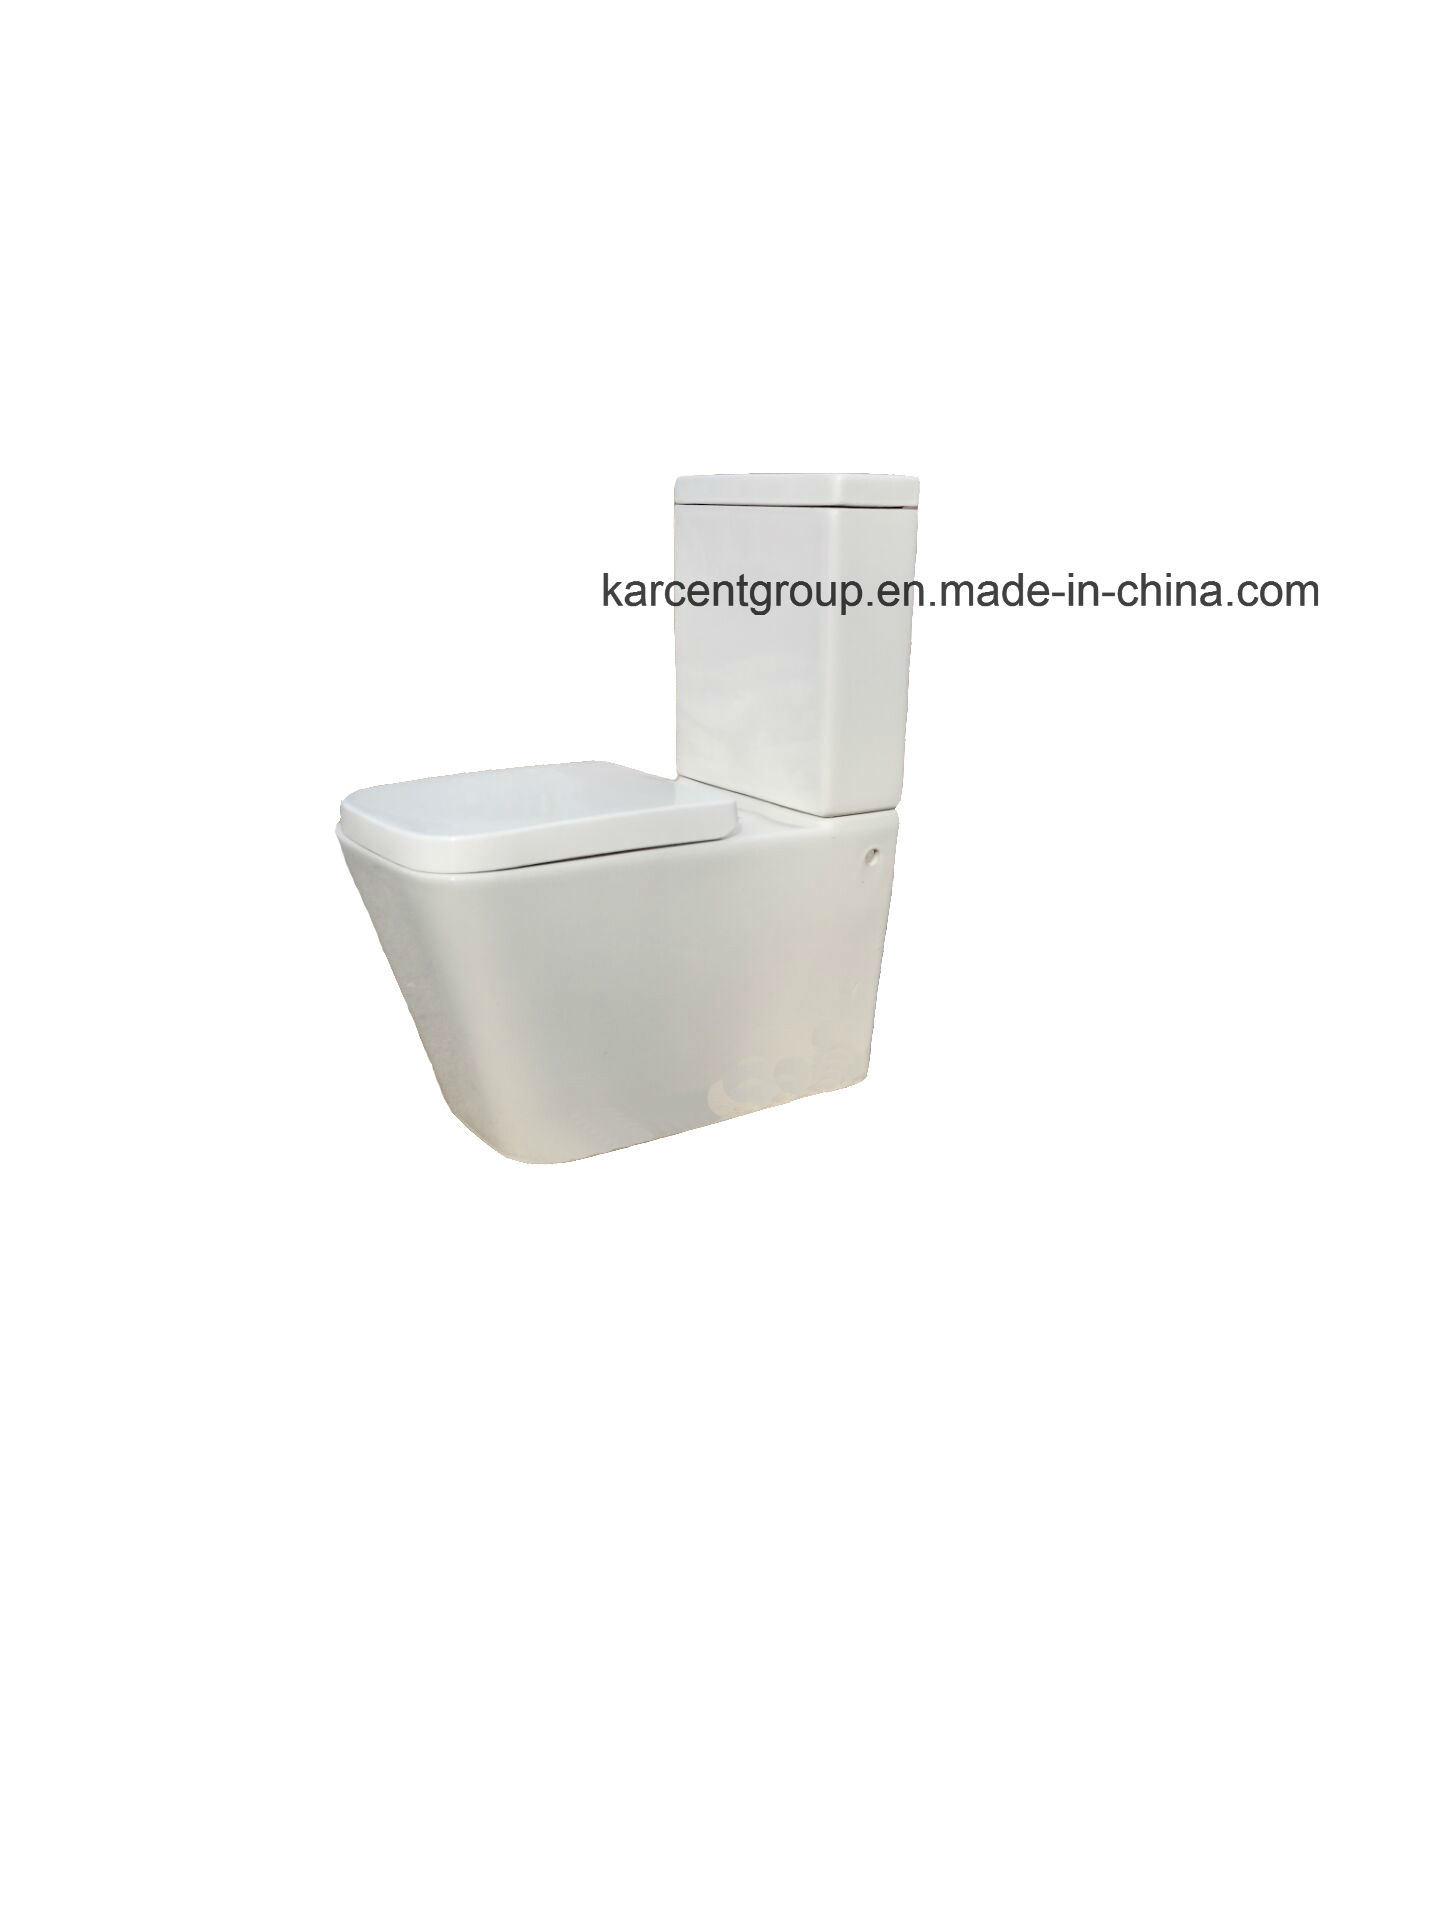 Two Piece Ceramic Toilet Washdown Toilet Water Closet Wc 10100b